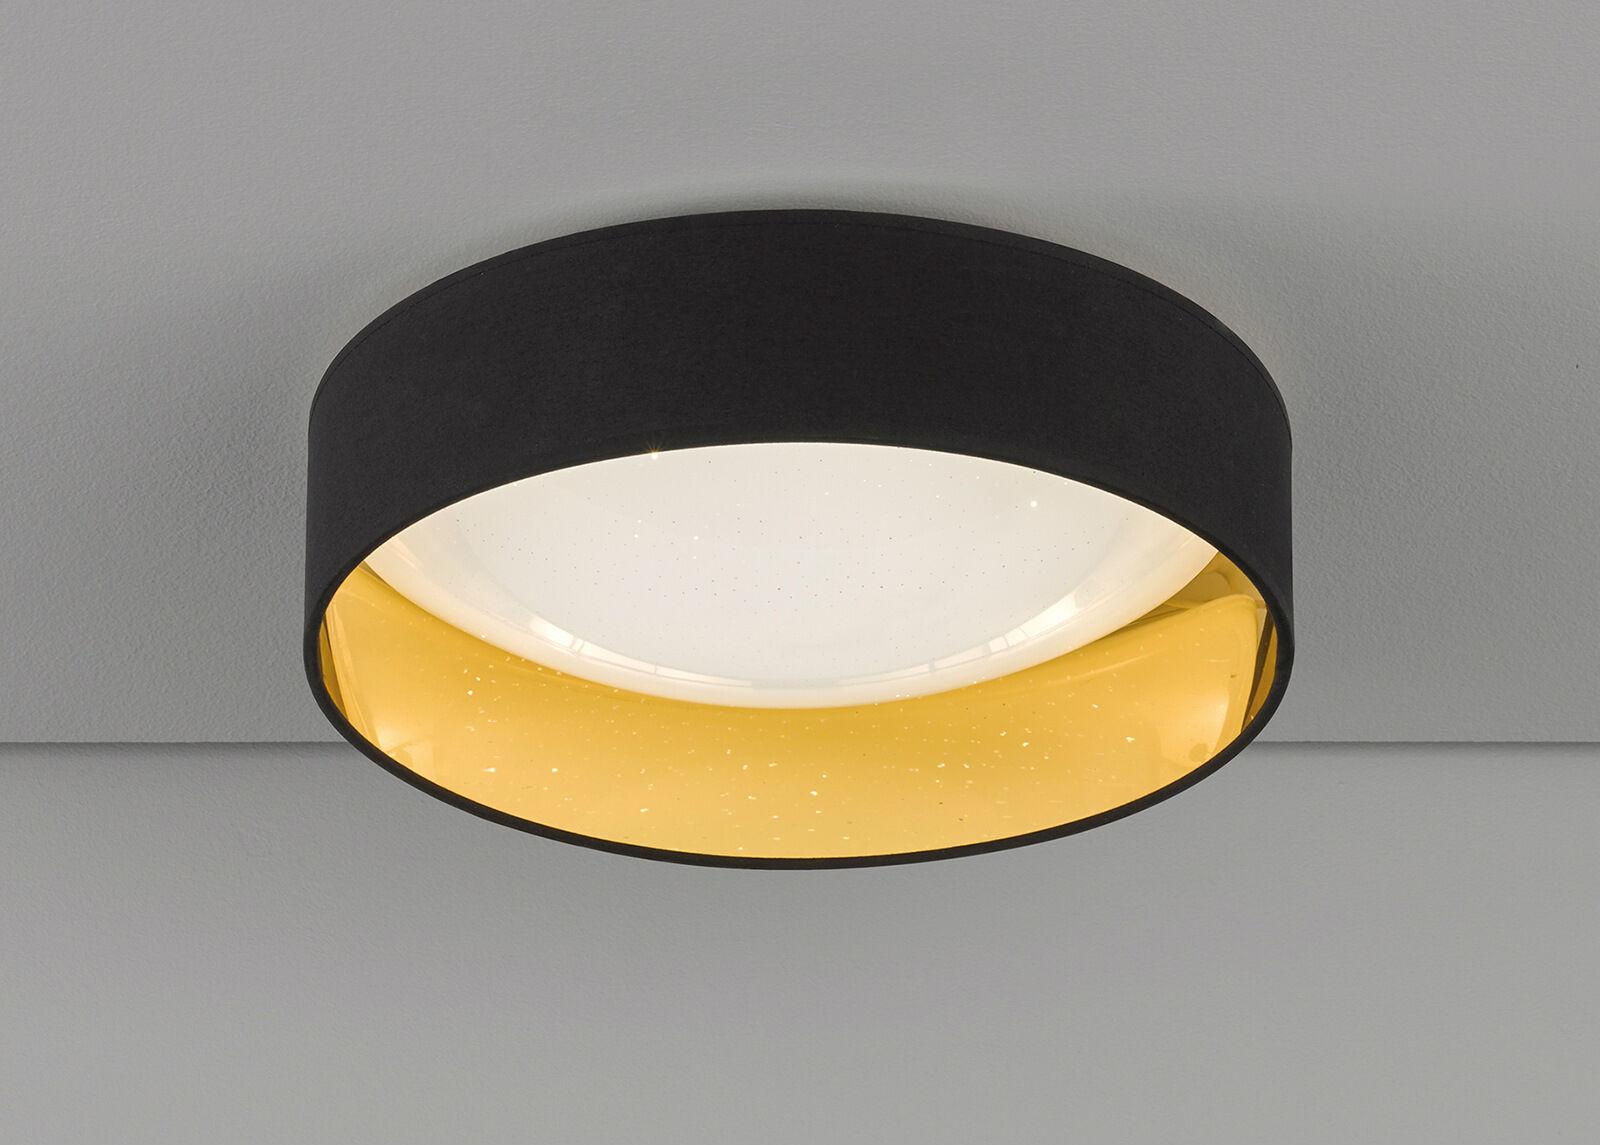 Honsel Kattovalaisin Sete LED